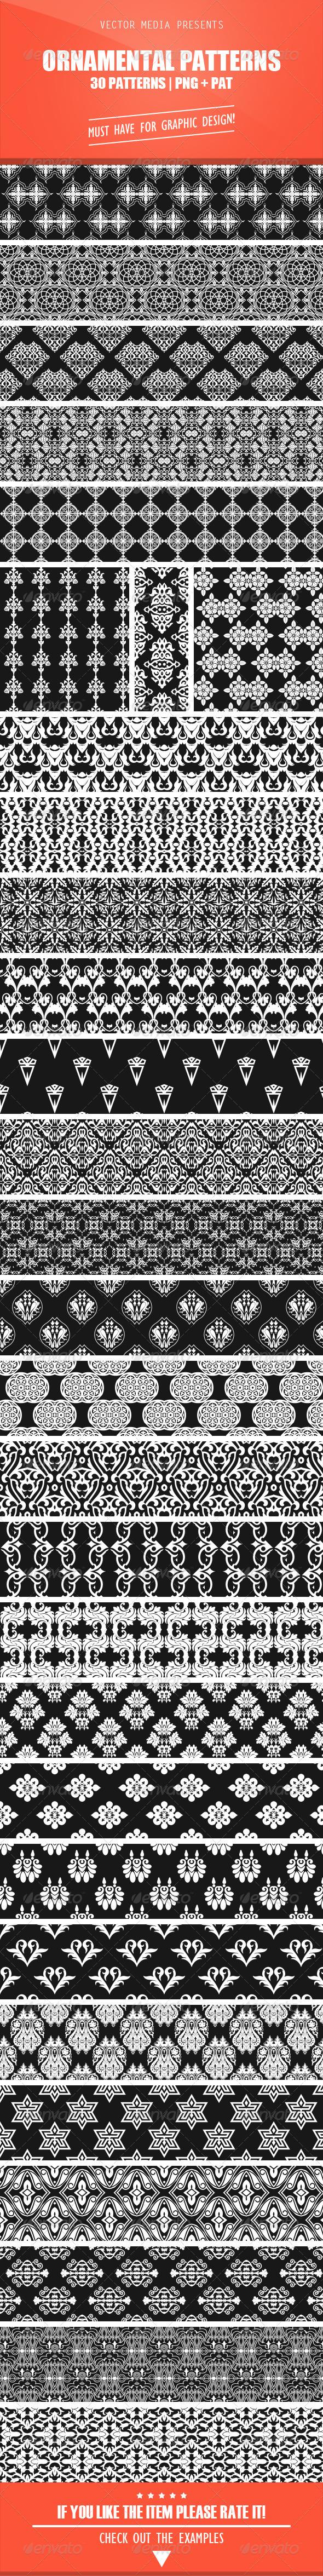 GraphicRiver Ornamental Patterns 4939137